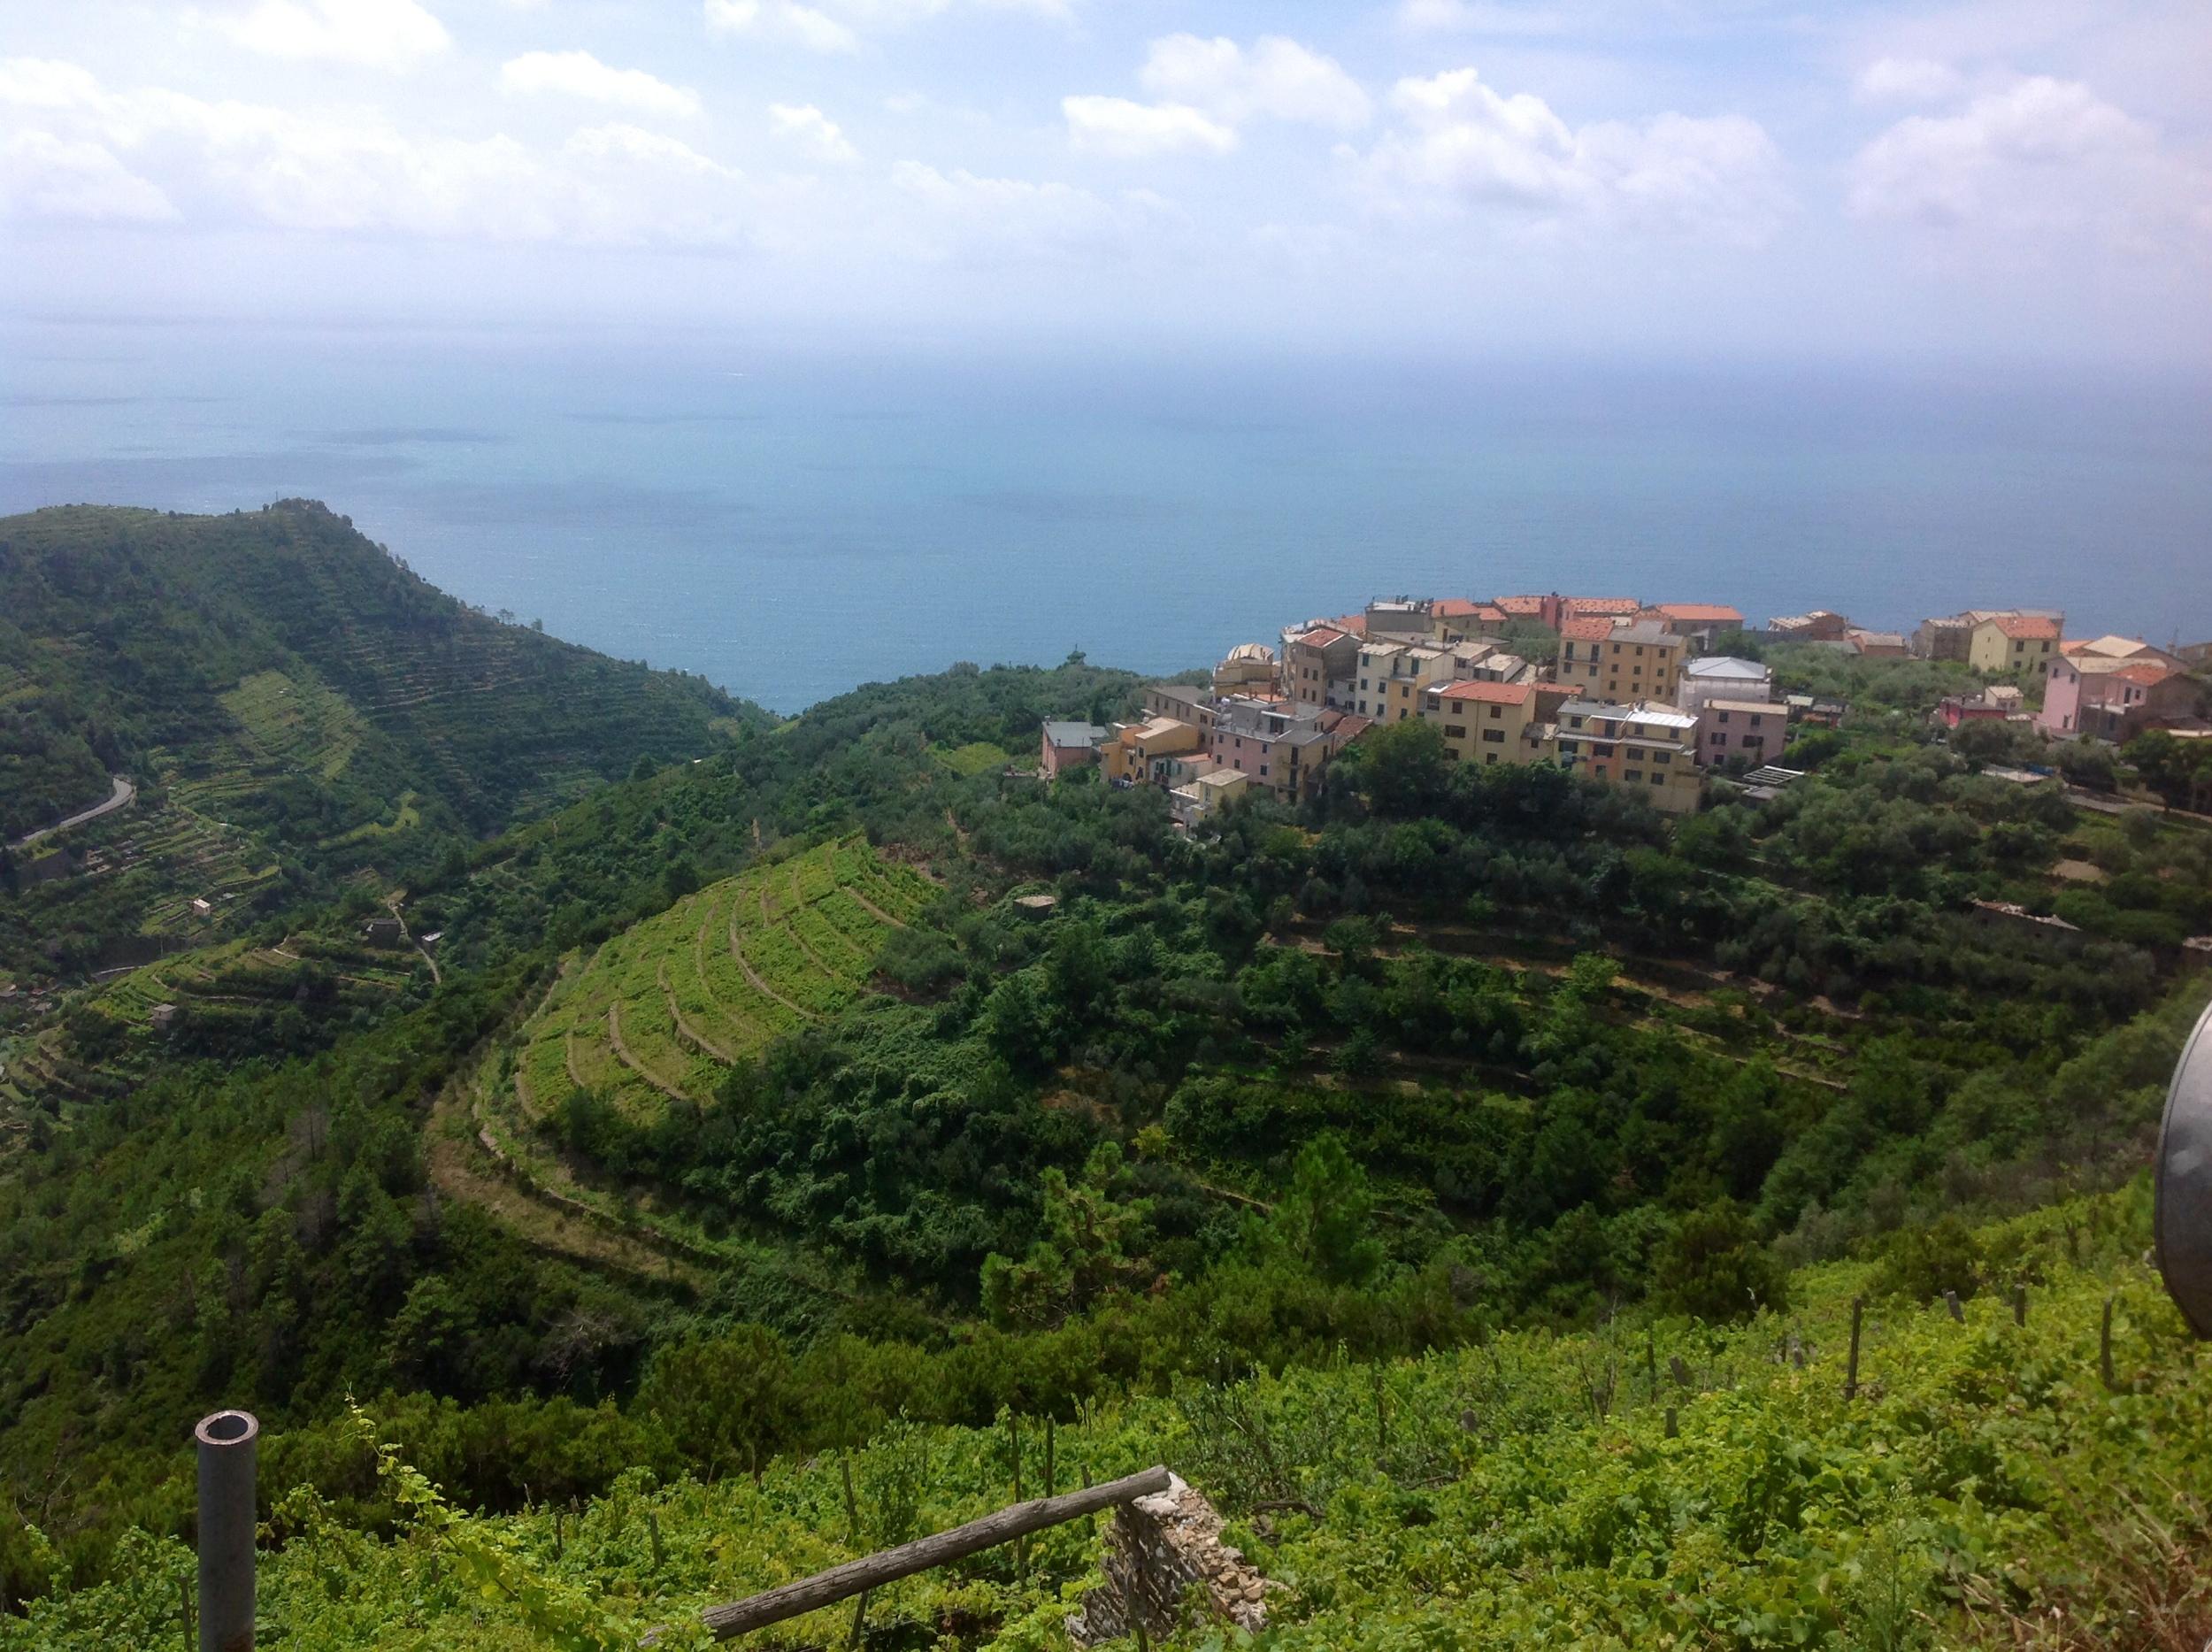 Overlooking Volastra